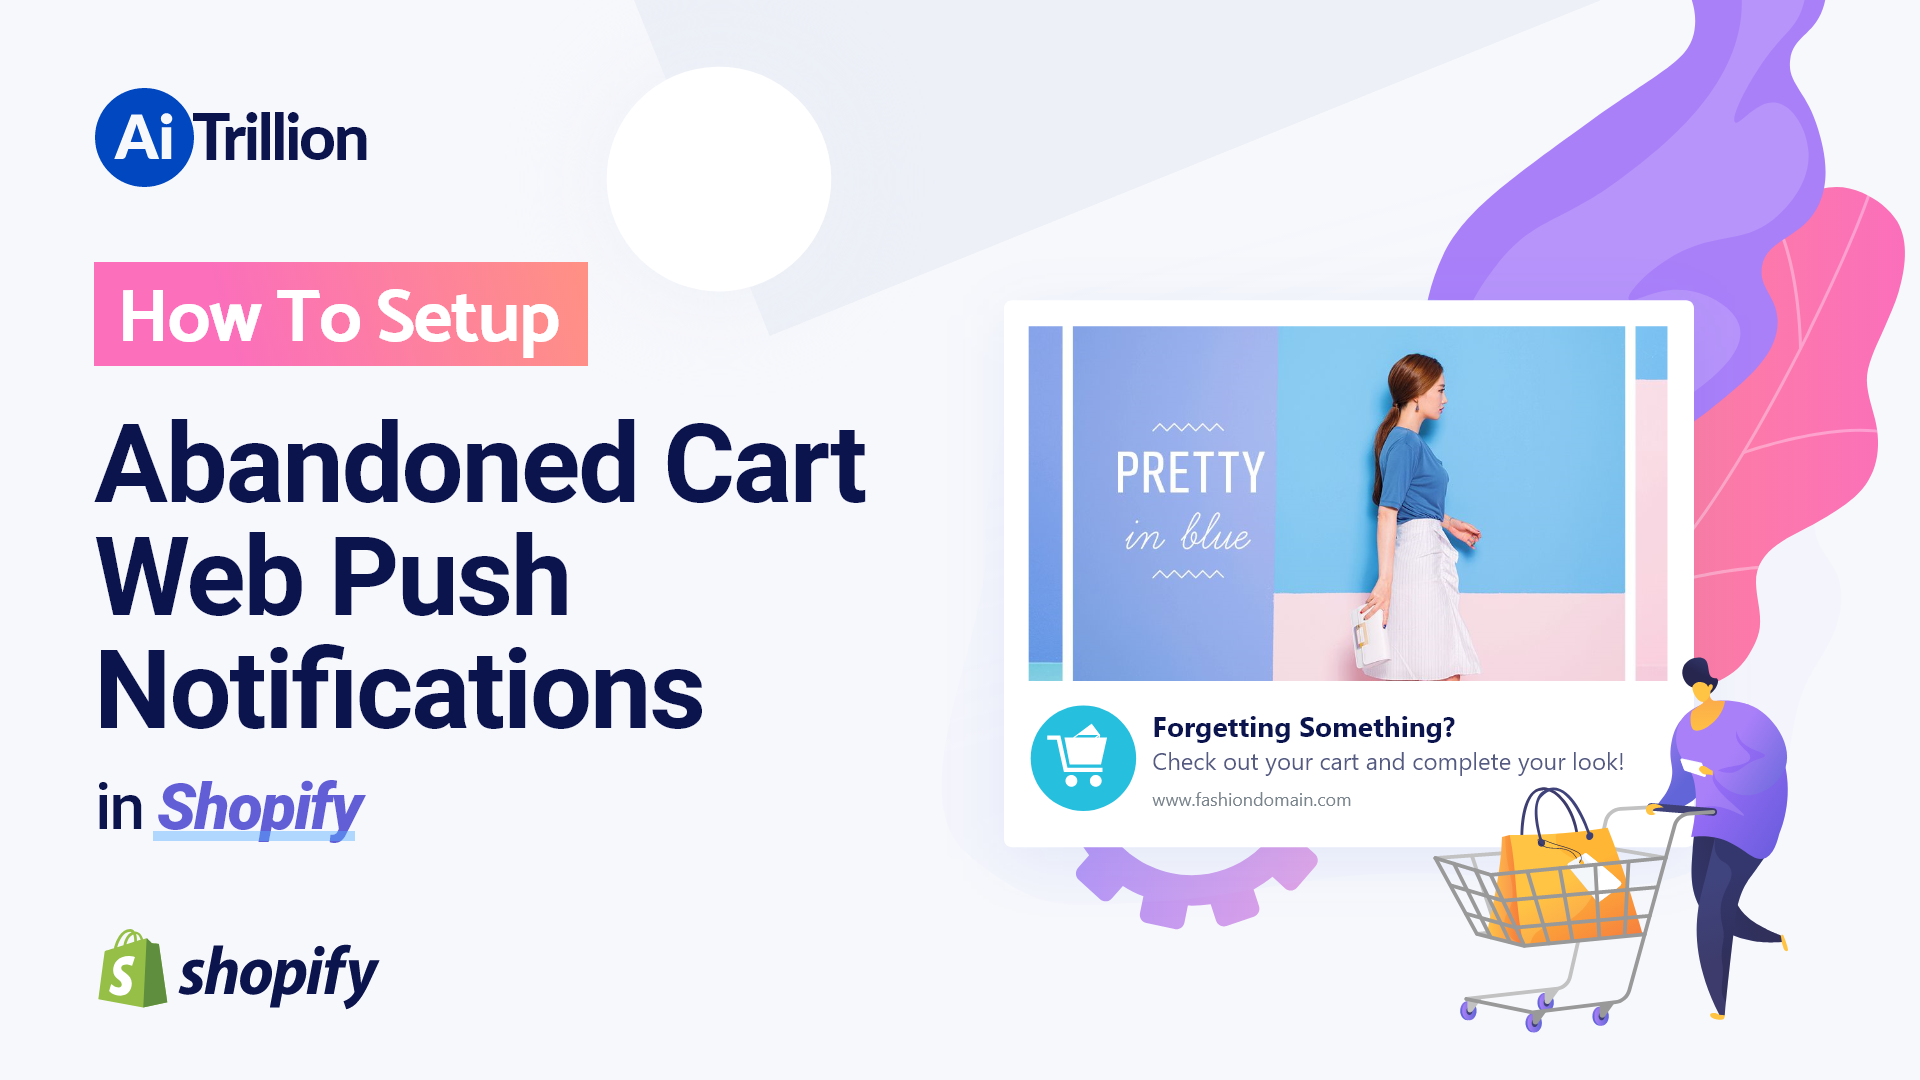 Set up abandoned cart web push notifications